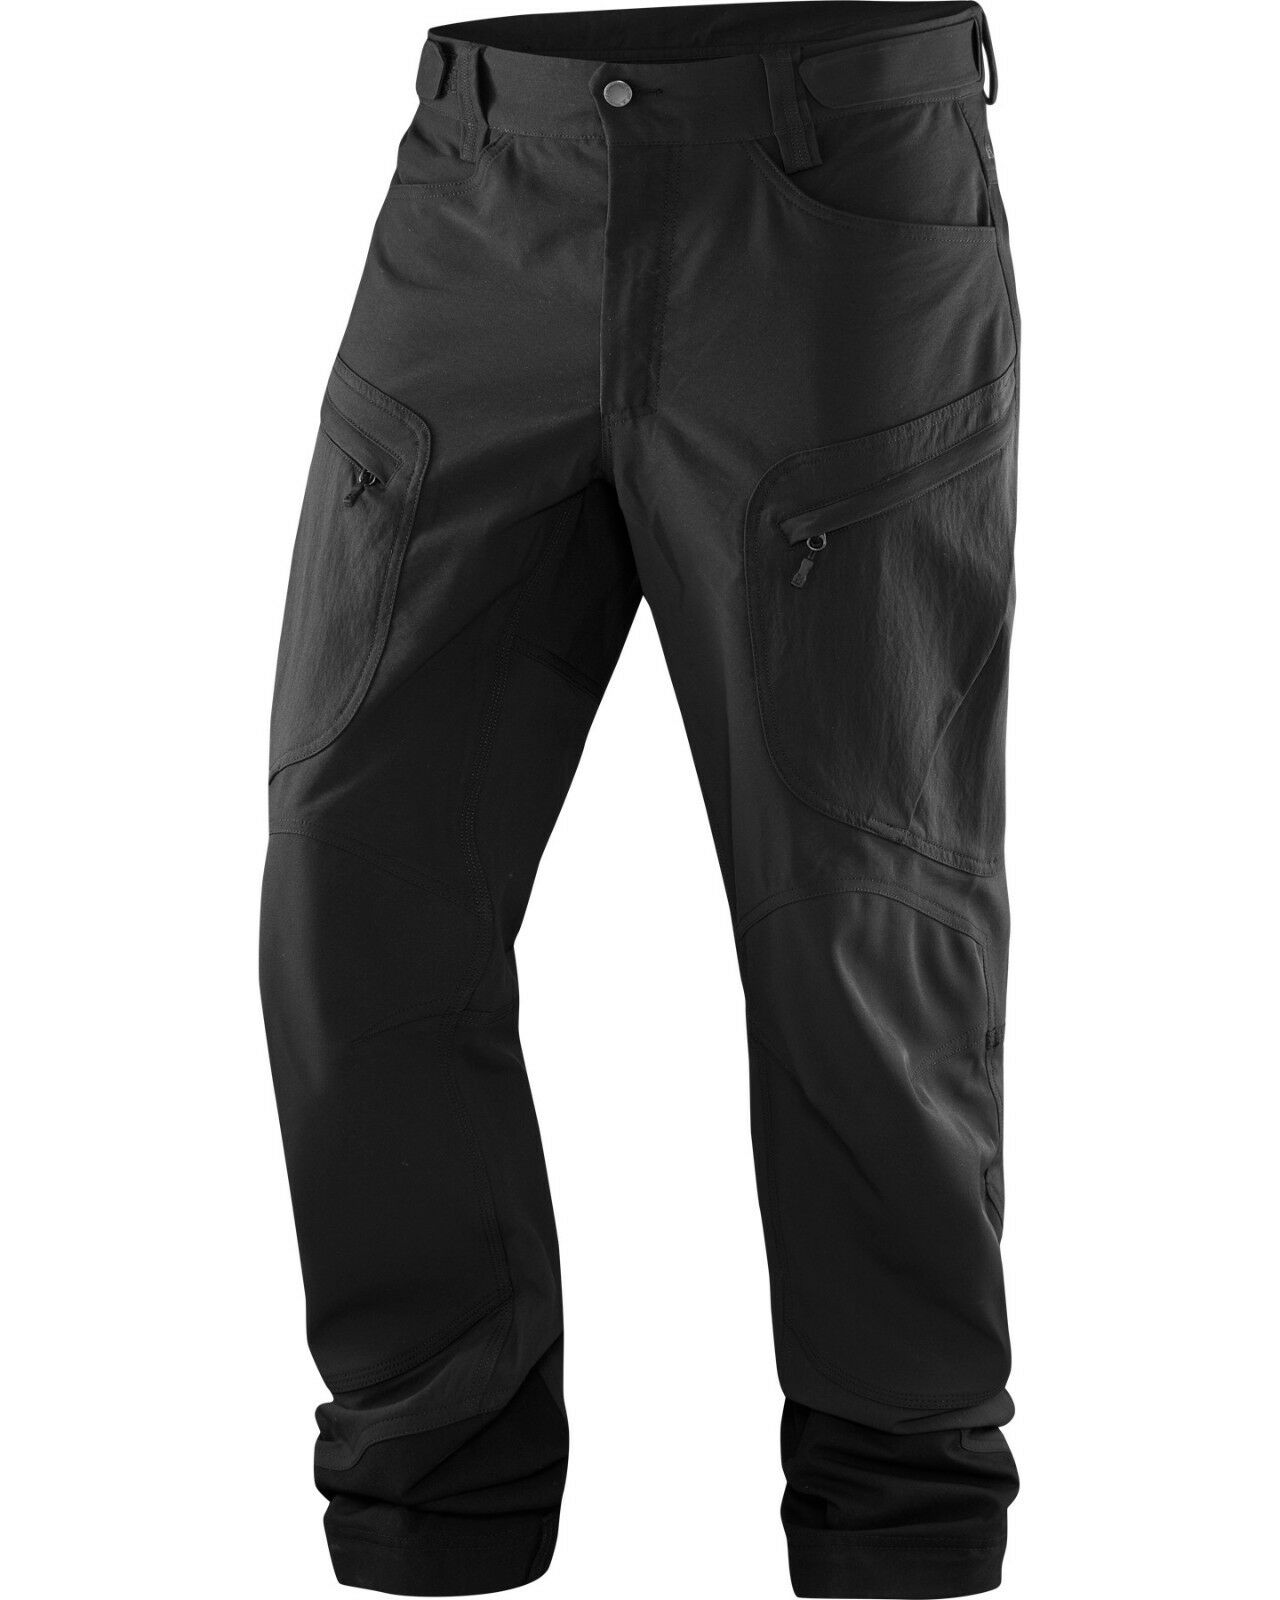 Haglofs robusto Mountain Pantaloni Vero Nero solido gamba regolare con Cintura Gratis